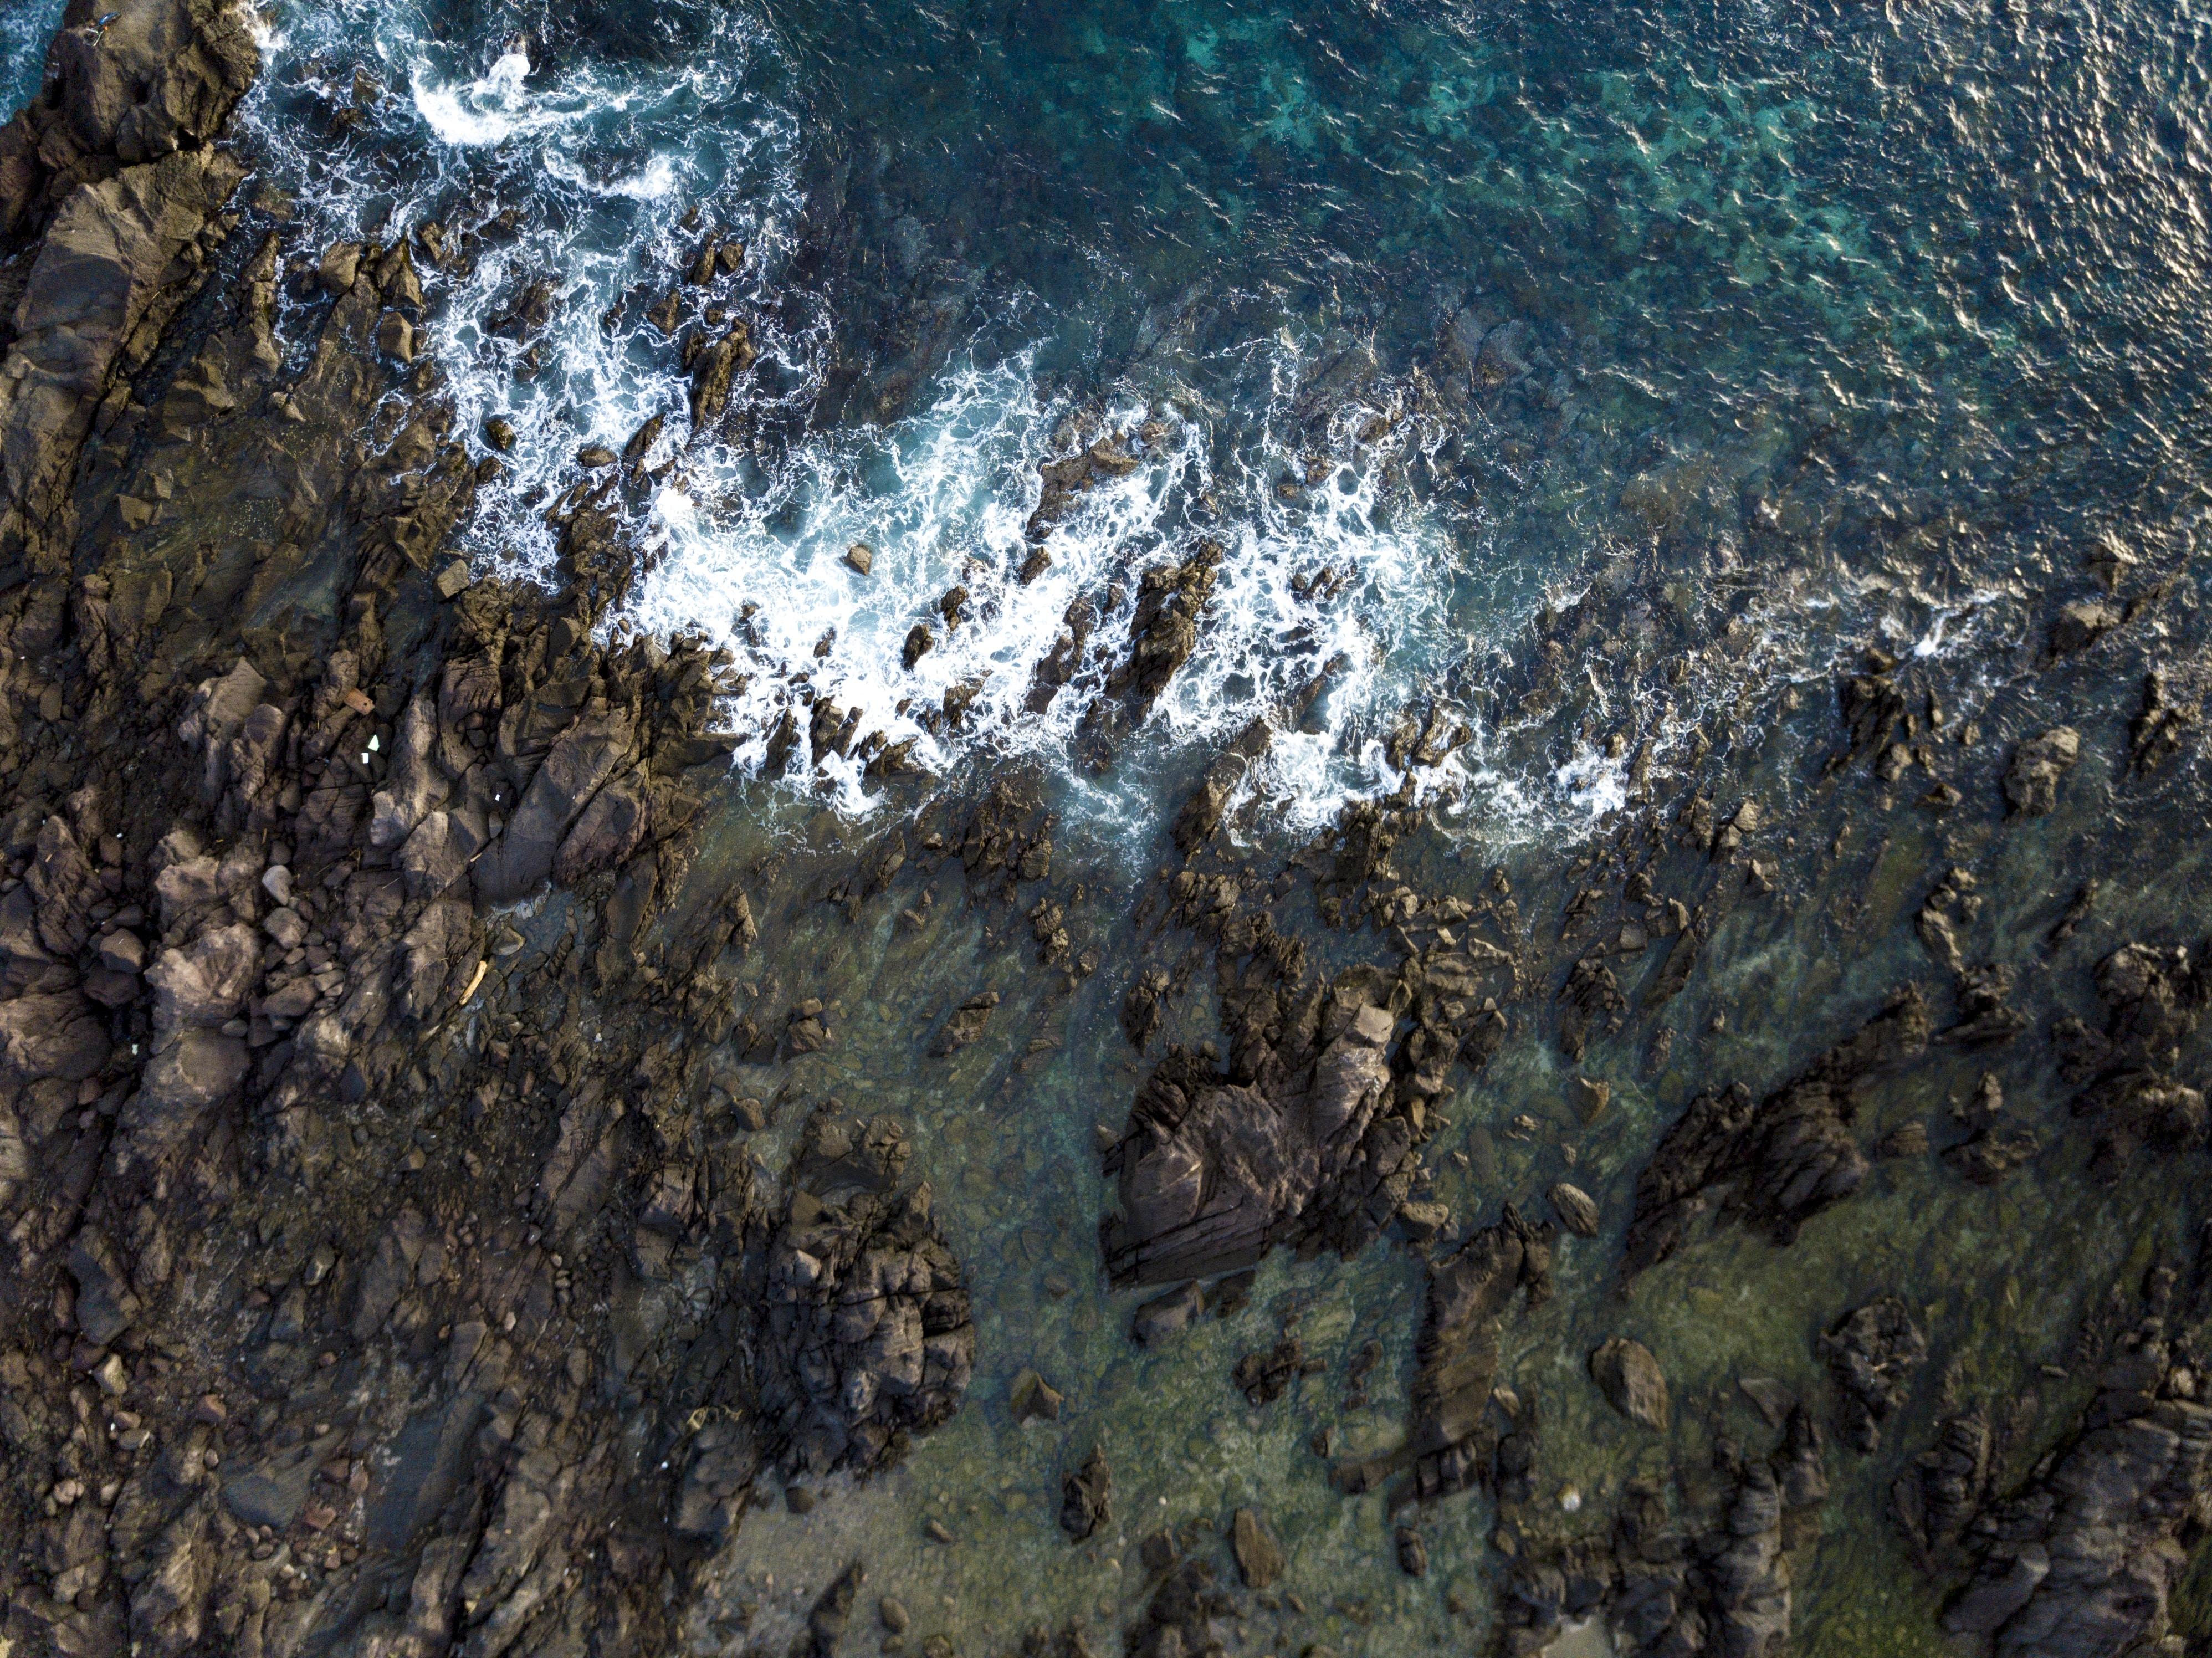 bird's eye view photo of rocks near body of water